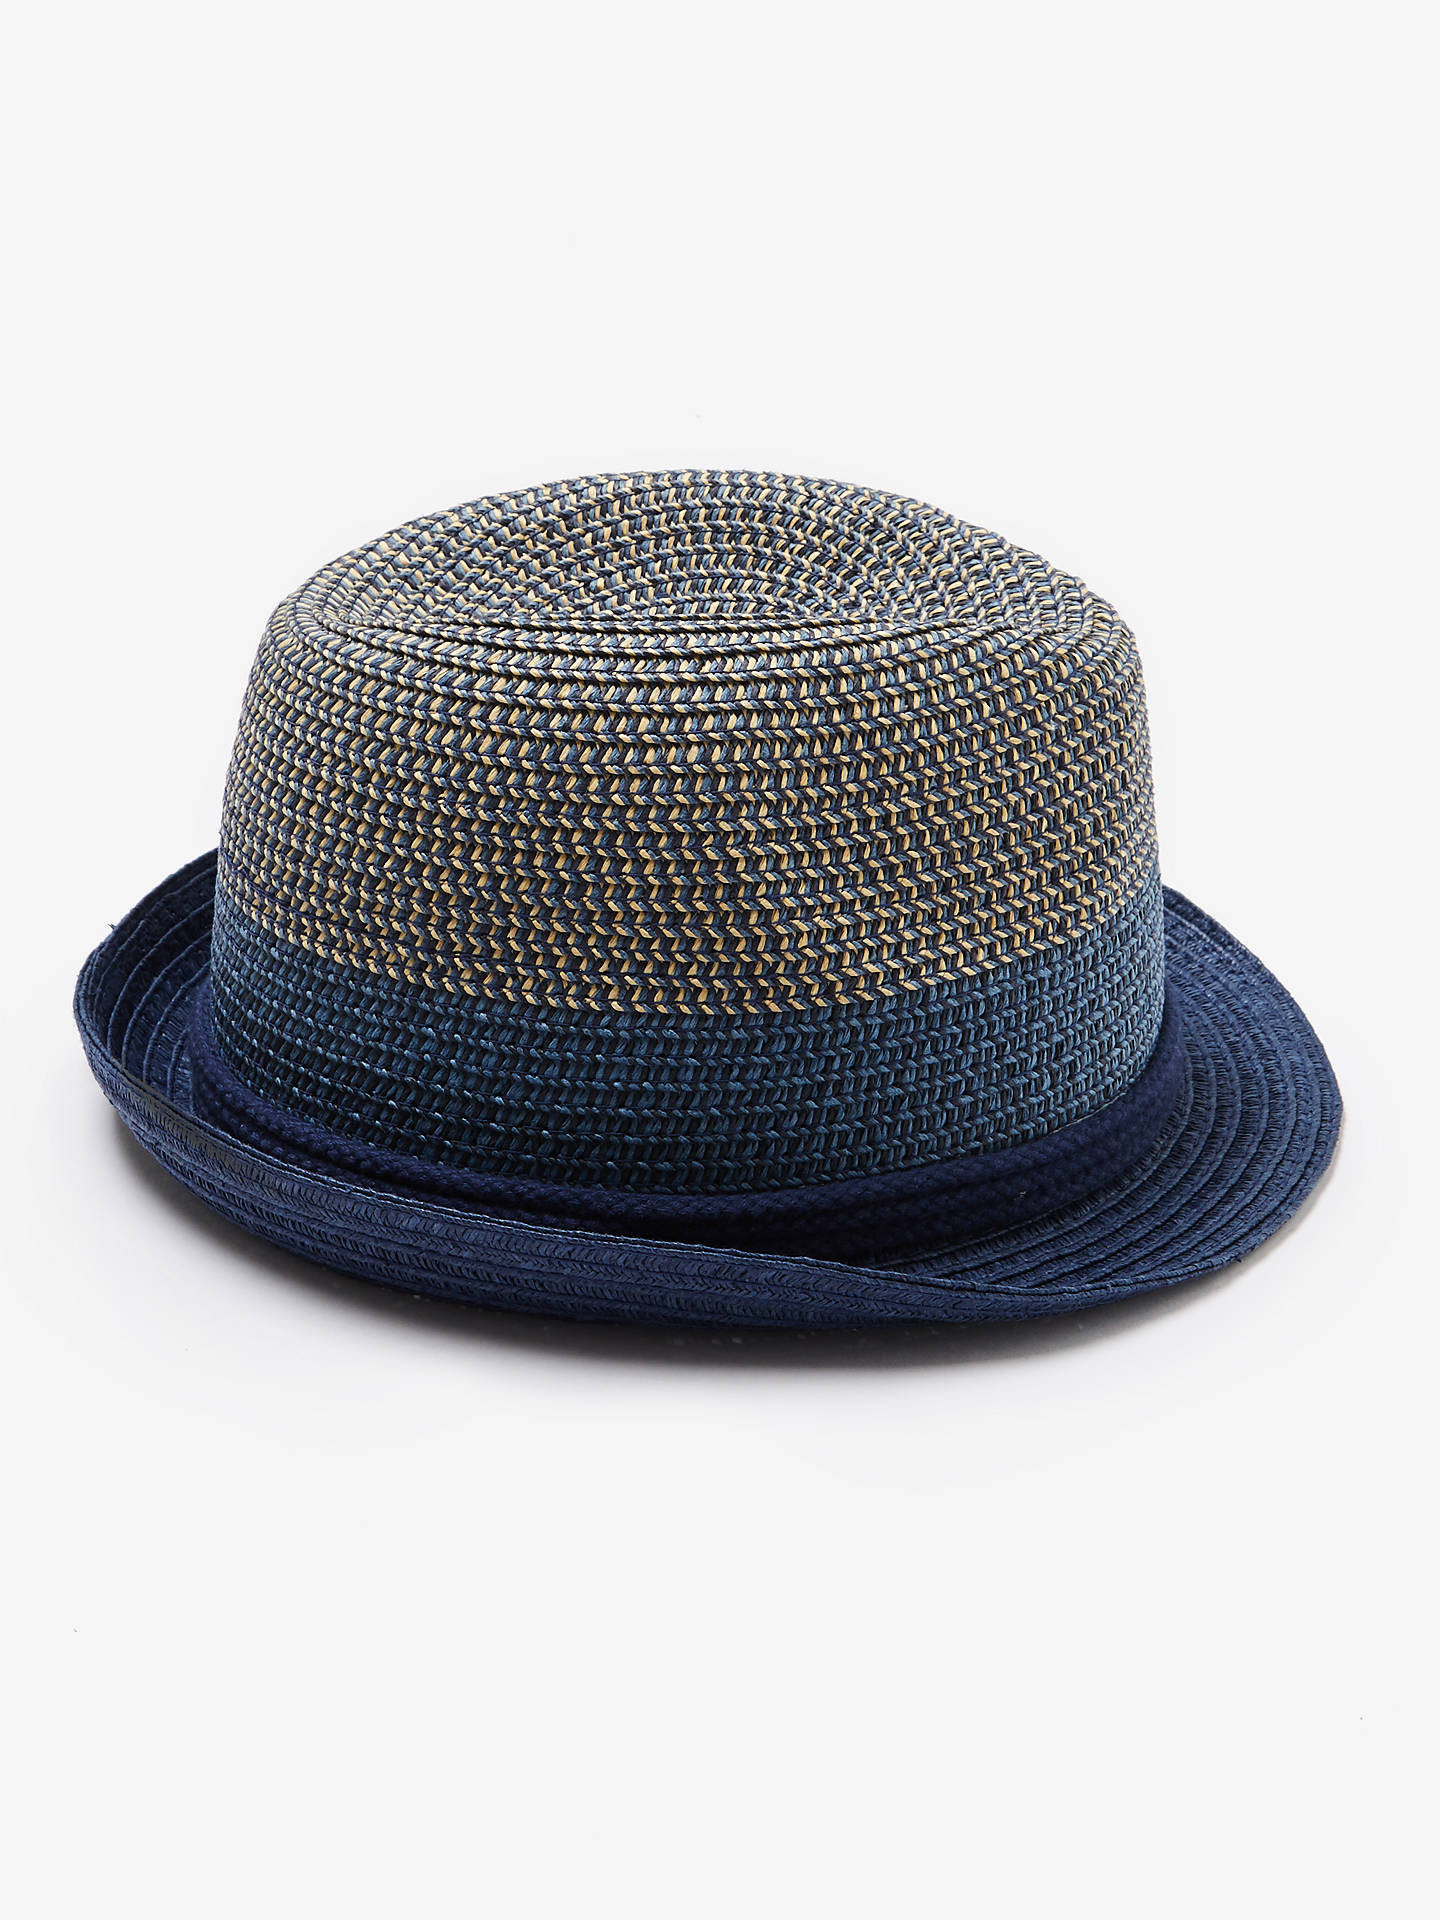 1661d1fab98412 ... Buy John Lewis & Partners Children's Tonal Trilby Woven Hat, Navy, 3-5